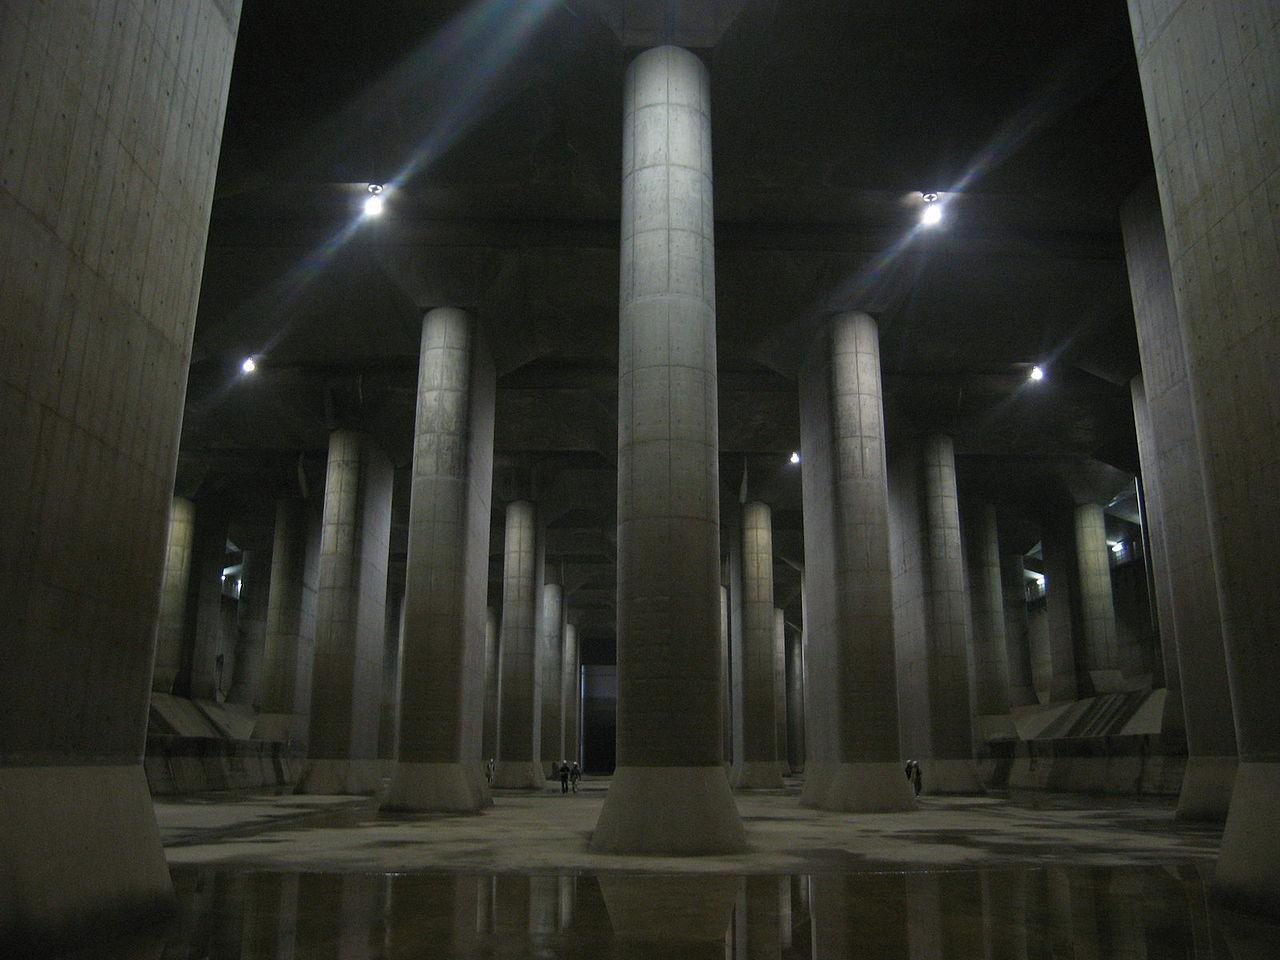 1280px-Kasukabe2006_06_07.jpg